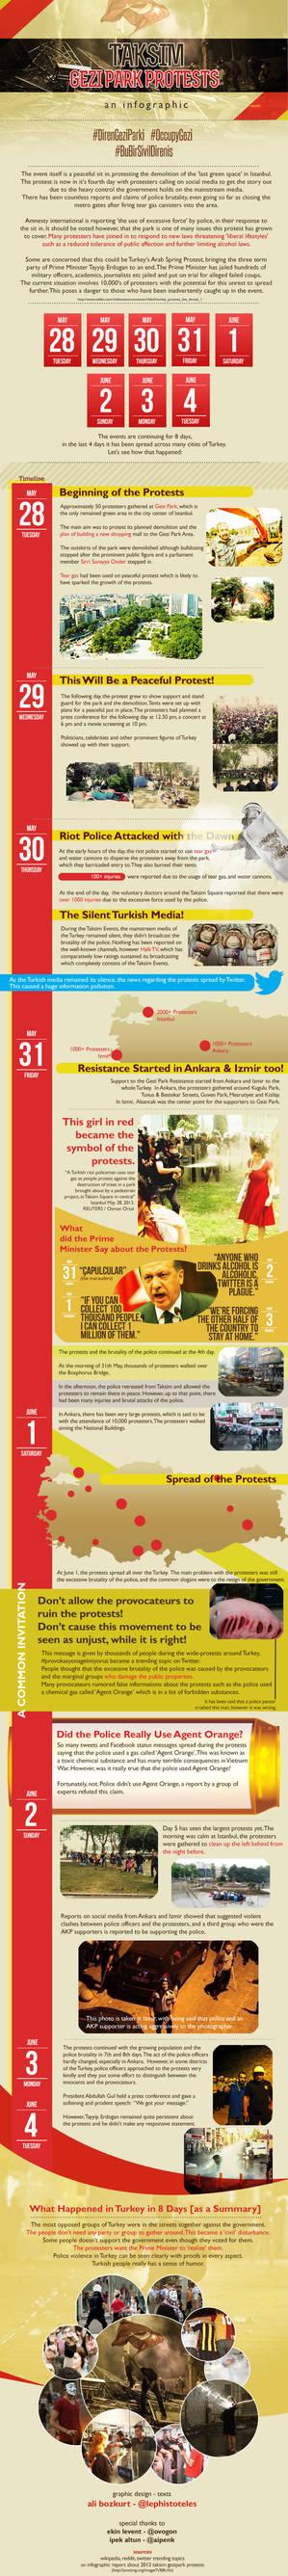 Taksim Gezi Park Protests Infographic